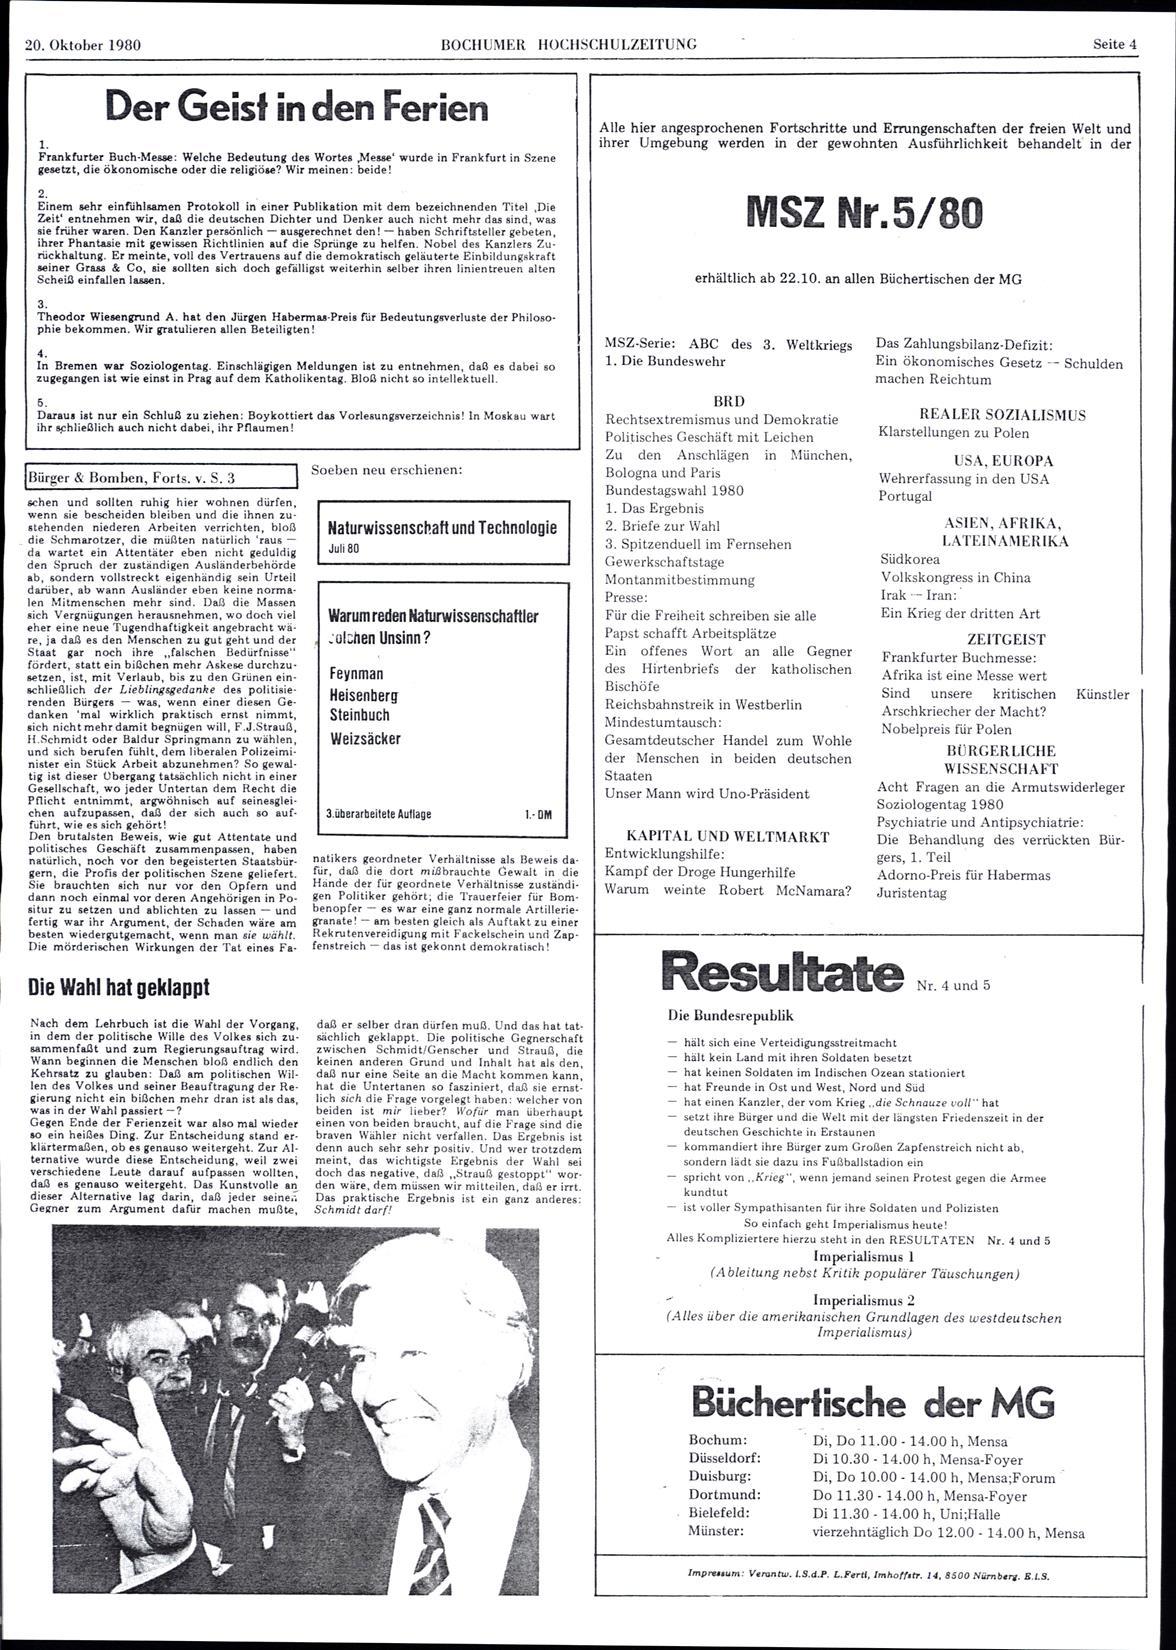 Bochum_BHZ_19801020_018_004